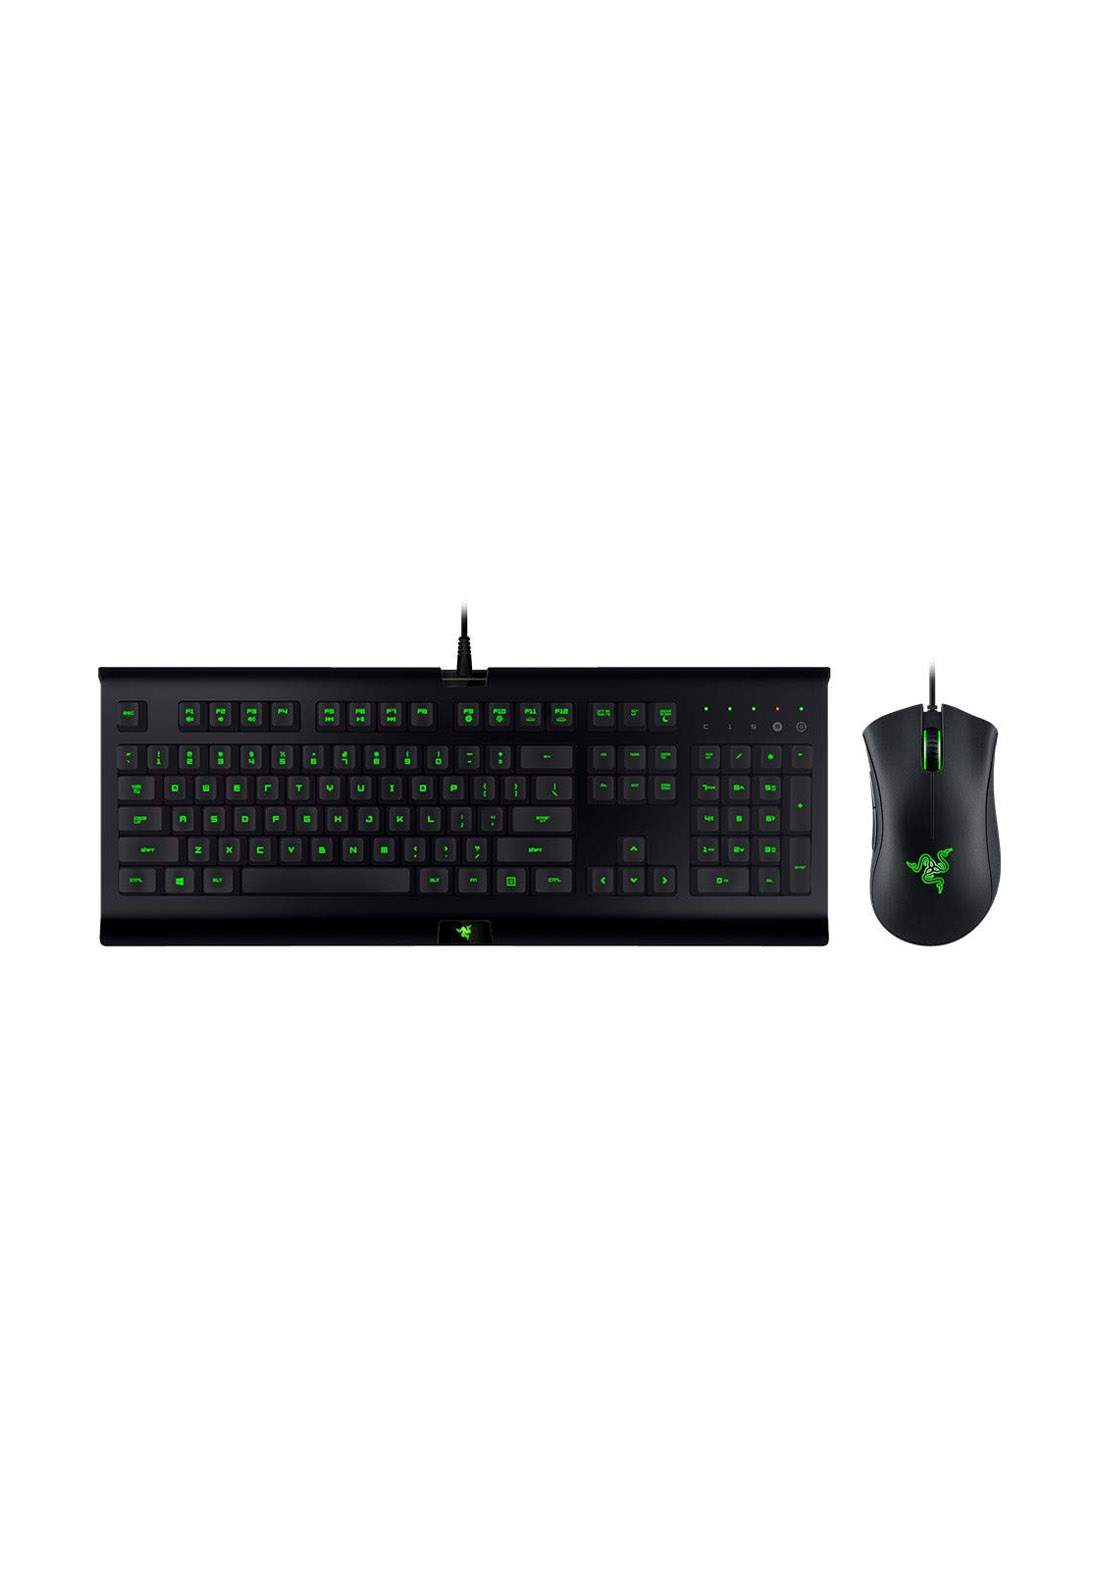 Razer Cynosa Pro Gaming Keyboard and  DeathAdder Optical Mouse - Black كيبورد وماوس